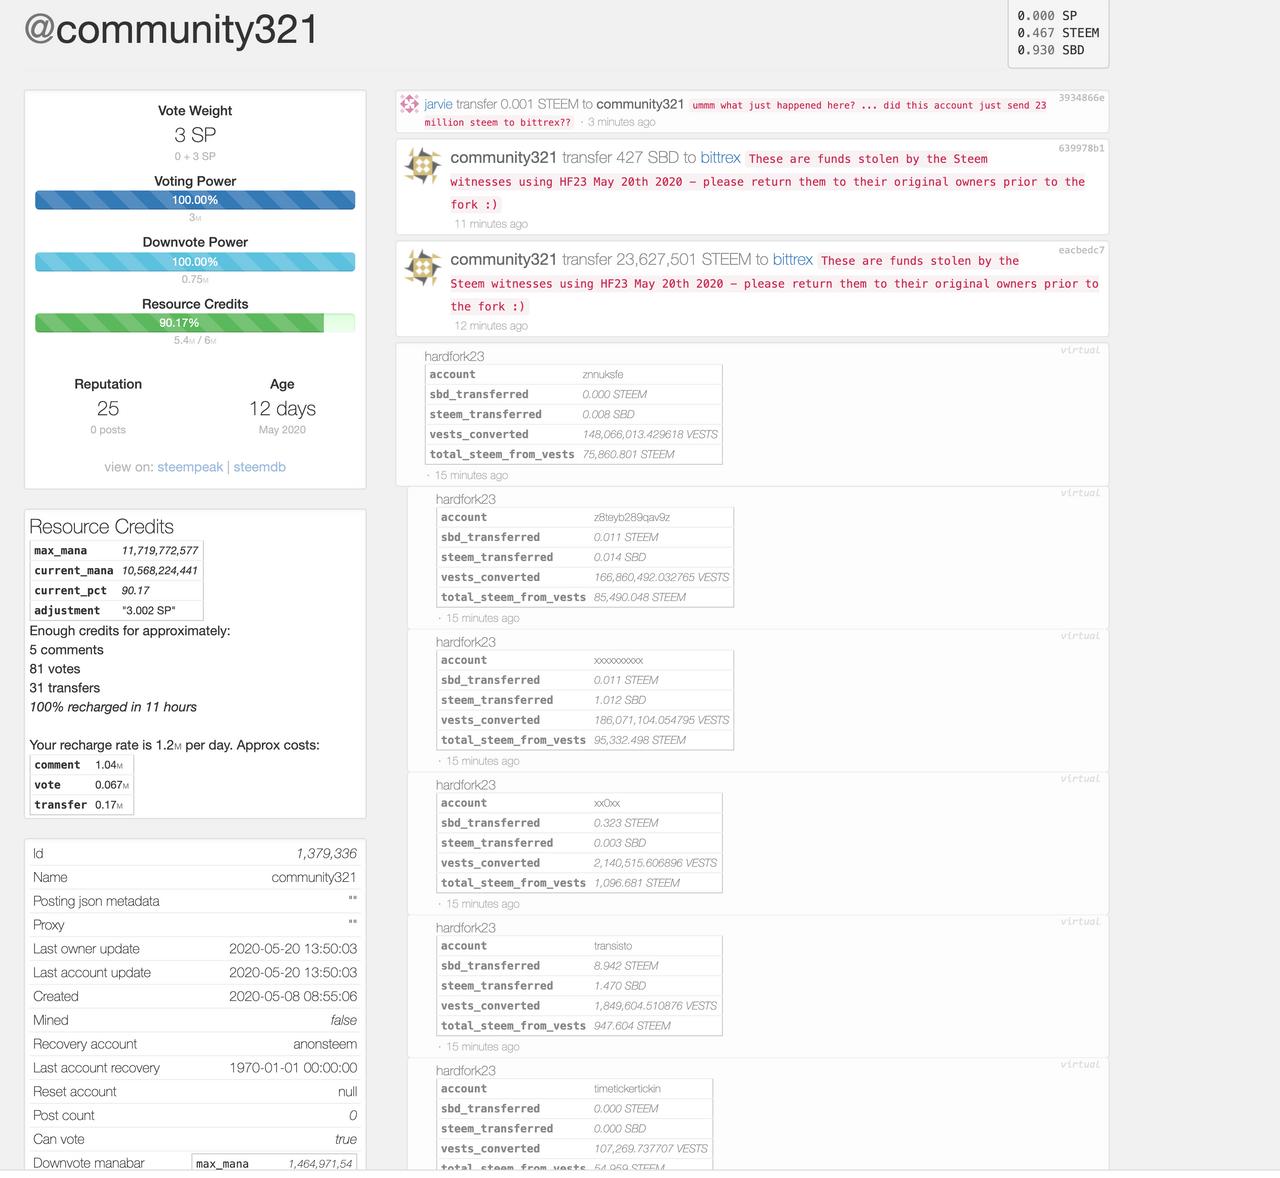 community321